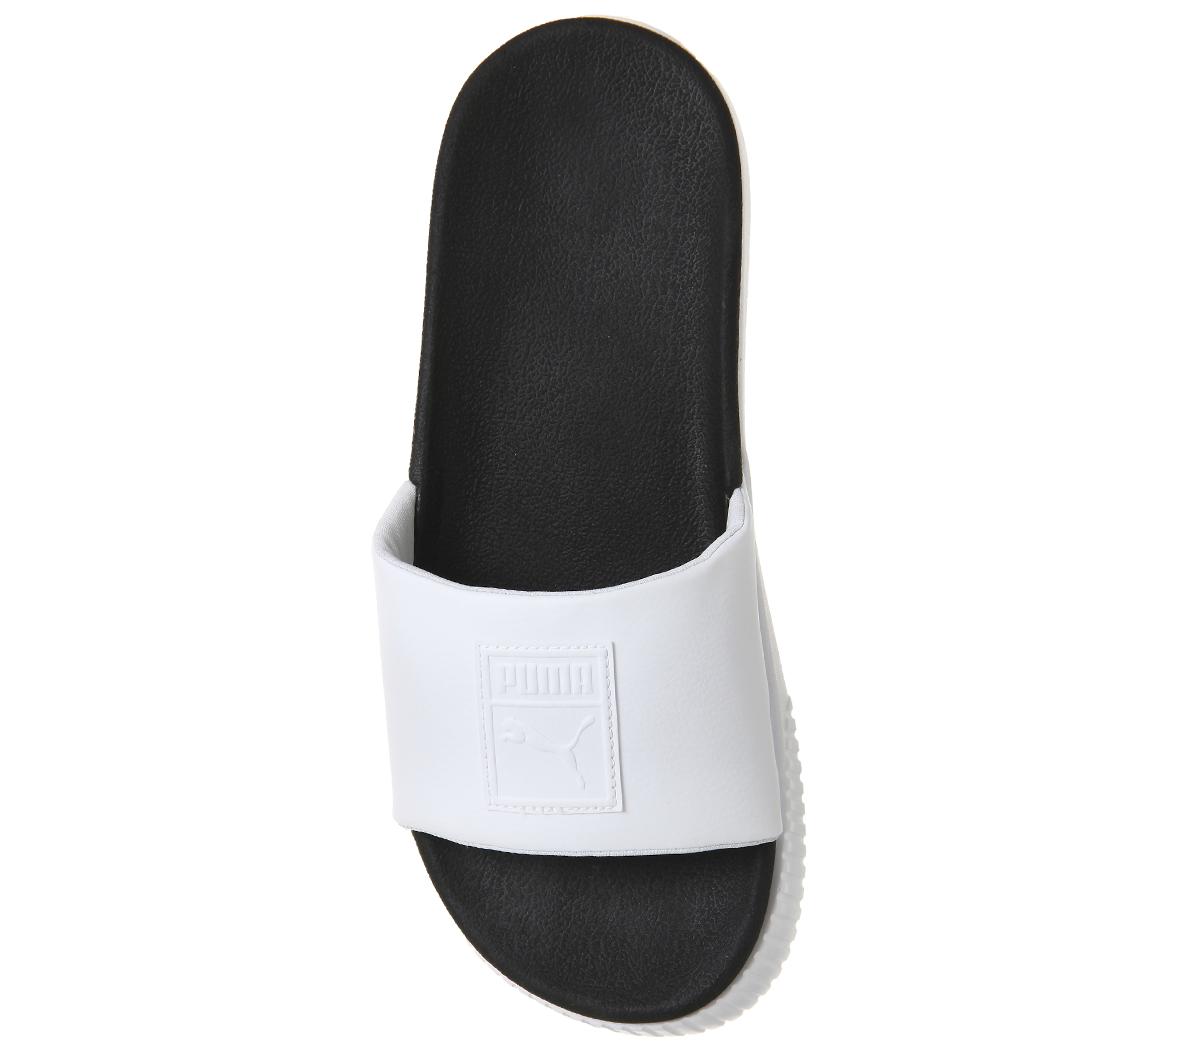 86e1b09845599 SENTINEL Puma Womens piattaforma diapositive PUMA PUMA bianco nero sandali